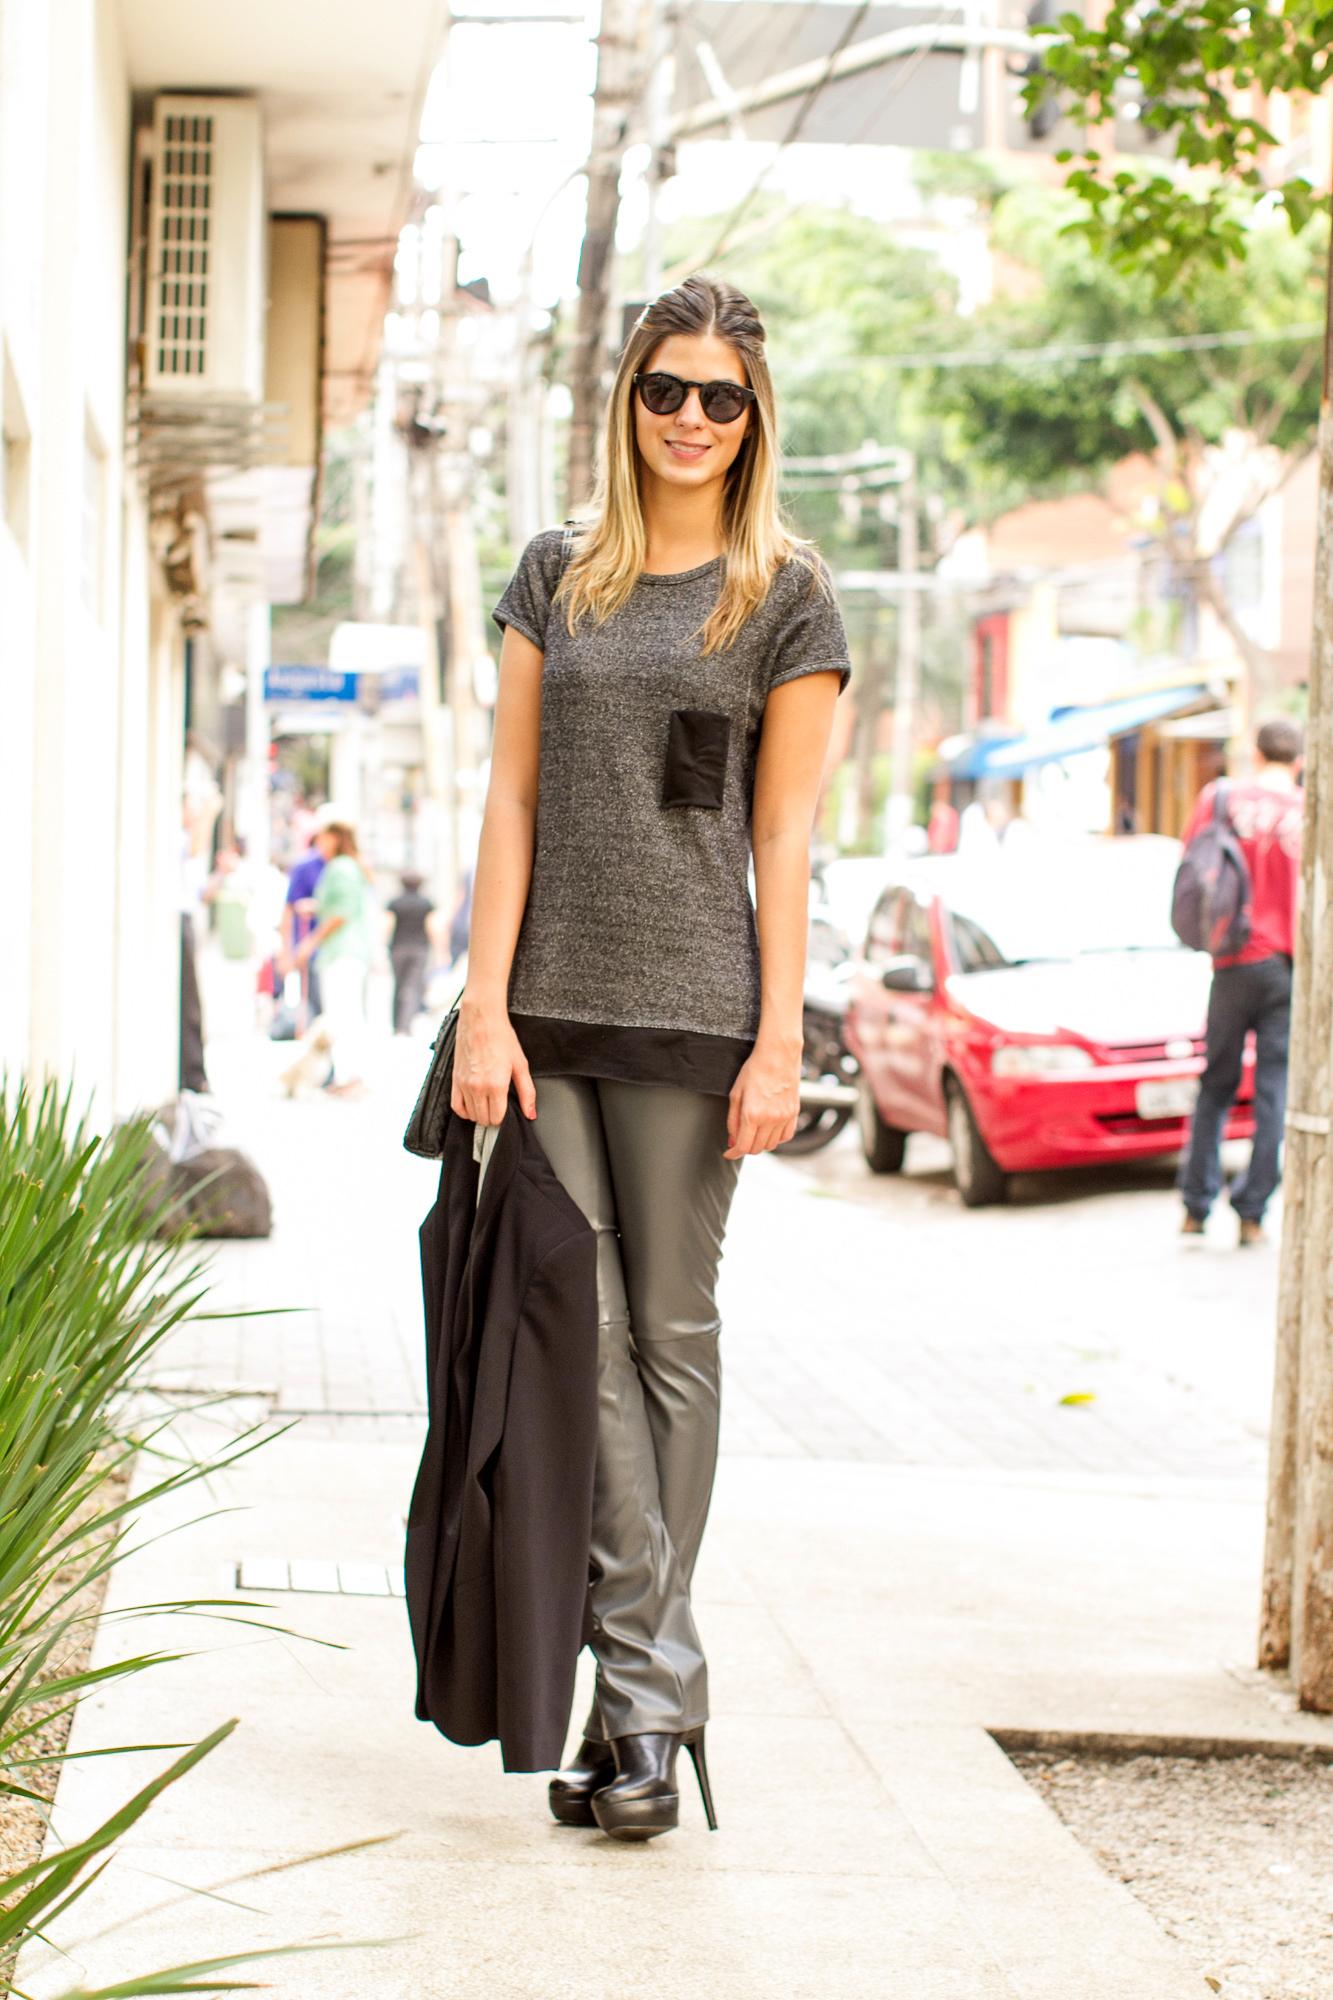 anna-fasano-fhits-shops-couro-cinza-02